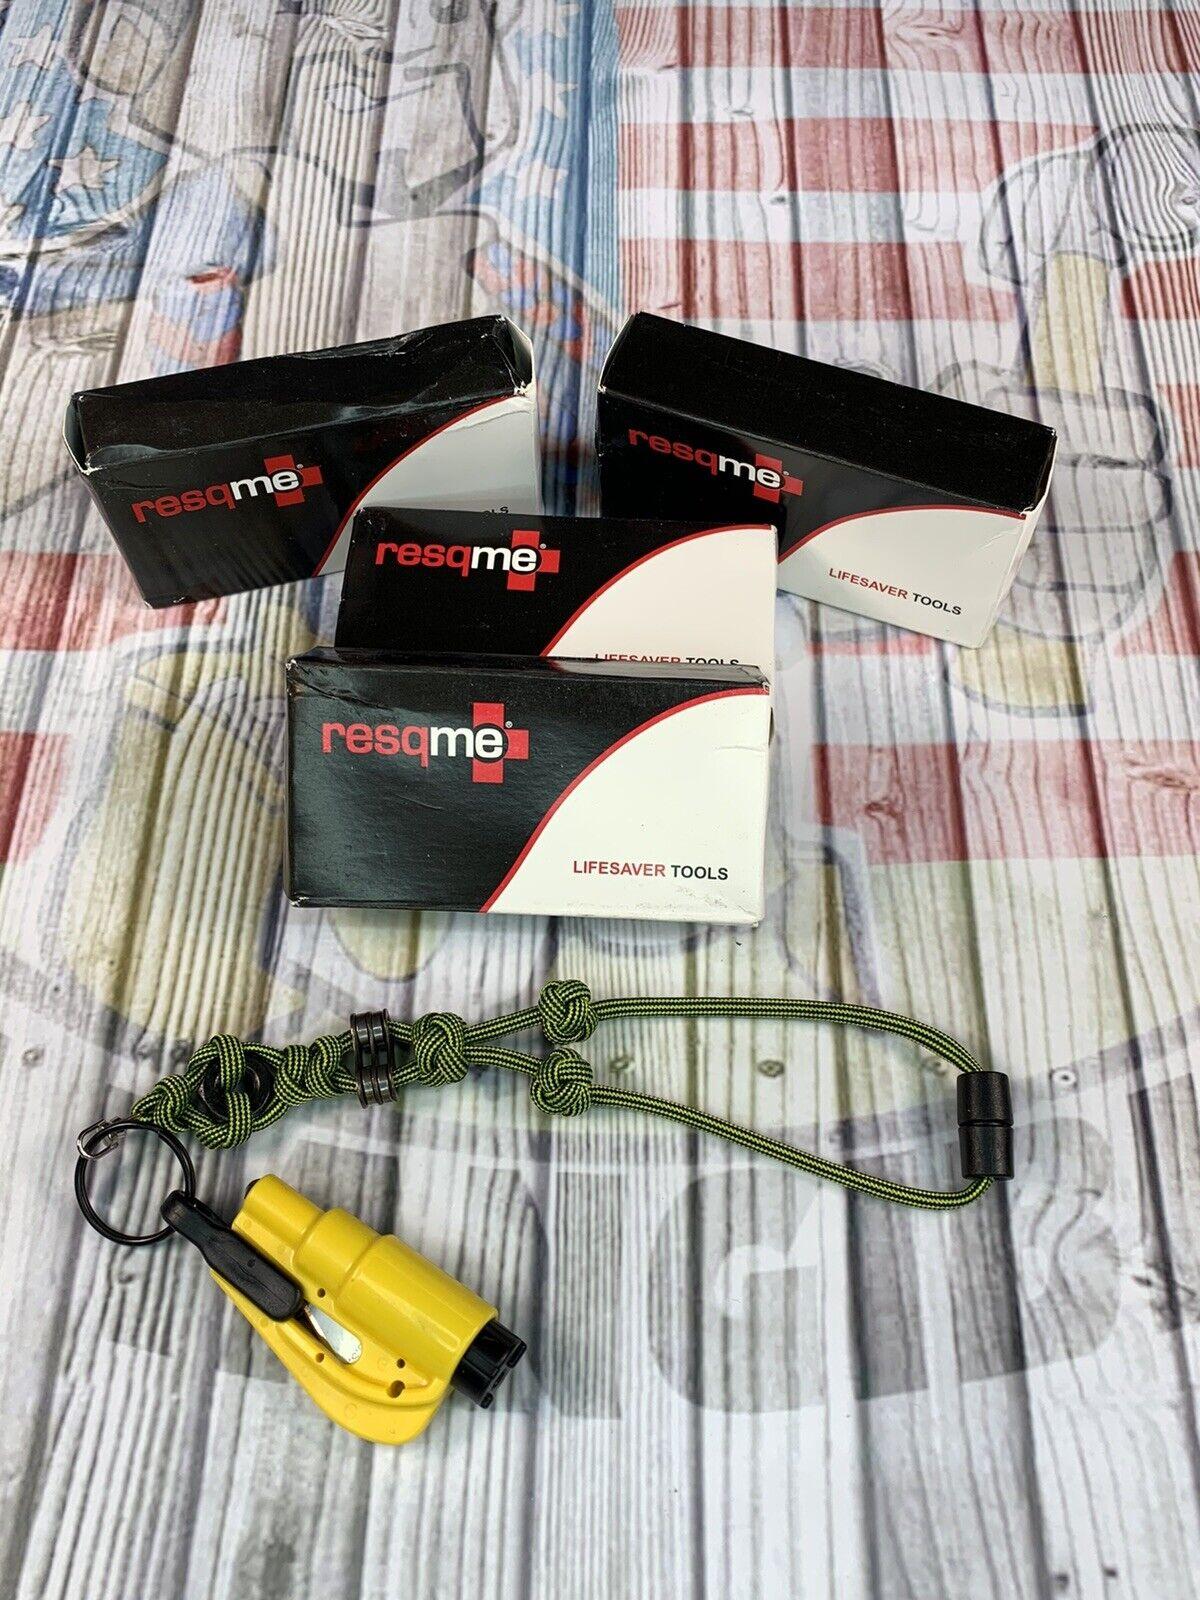 Resqme 04.100.09 Original Keychain Car Escape Tool Safety Yellow Seatbelt Cutter